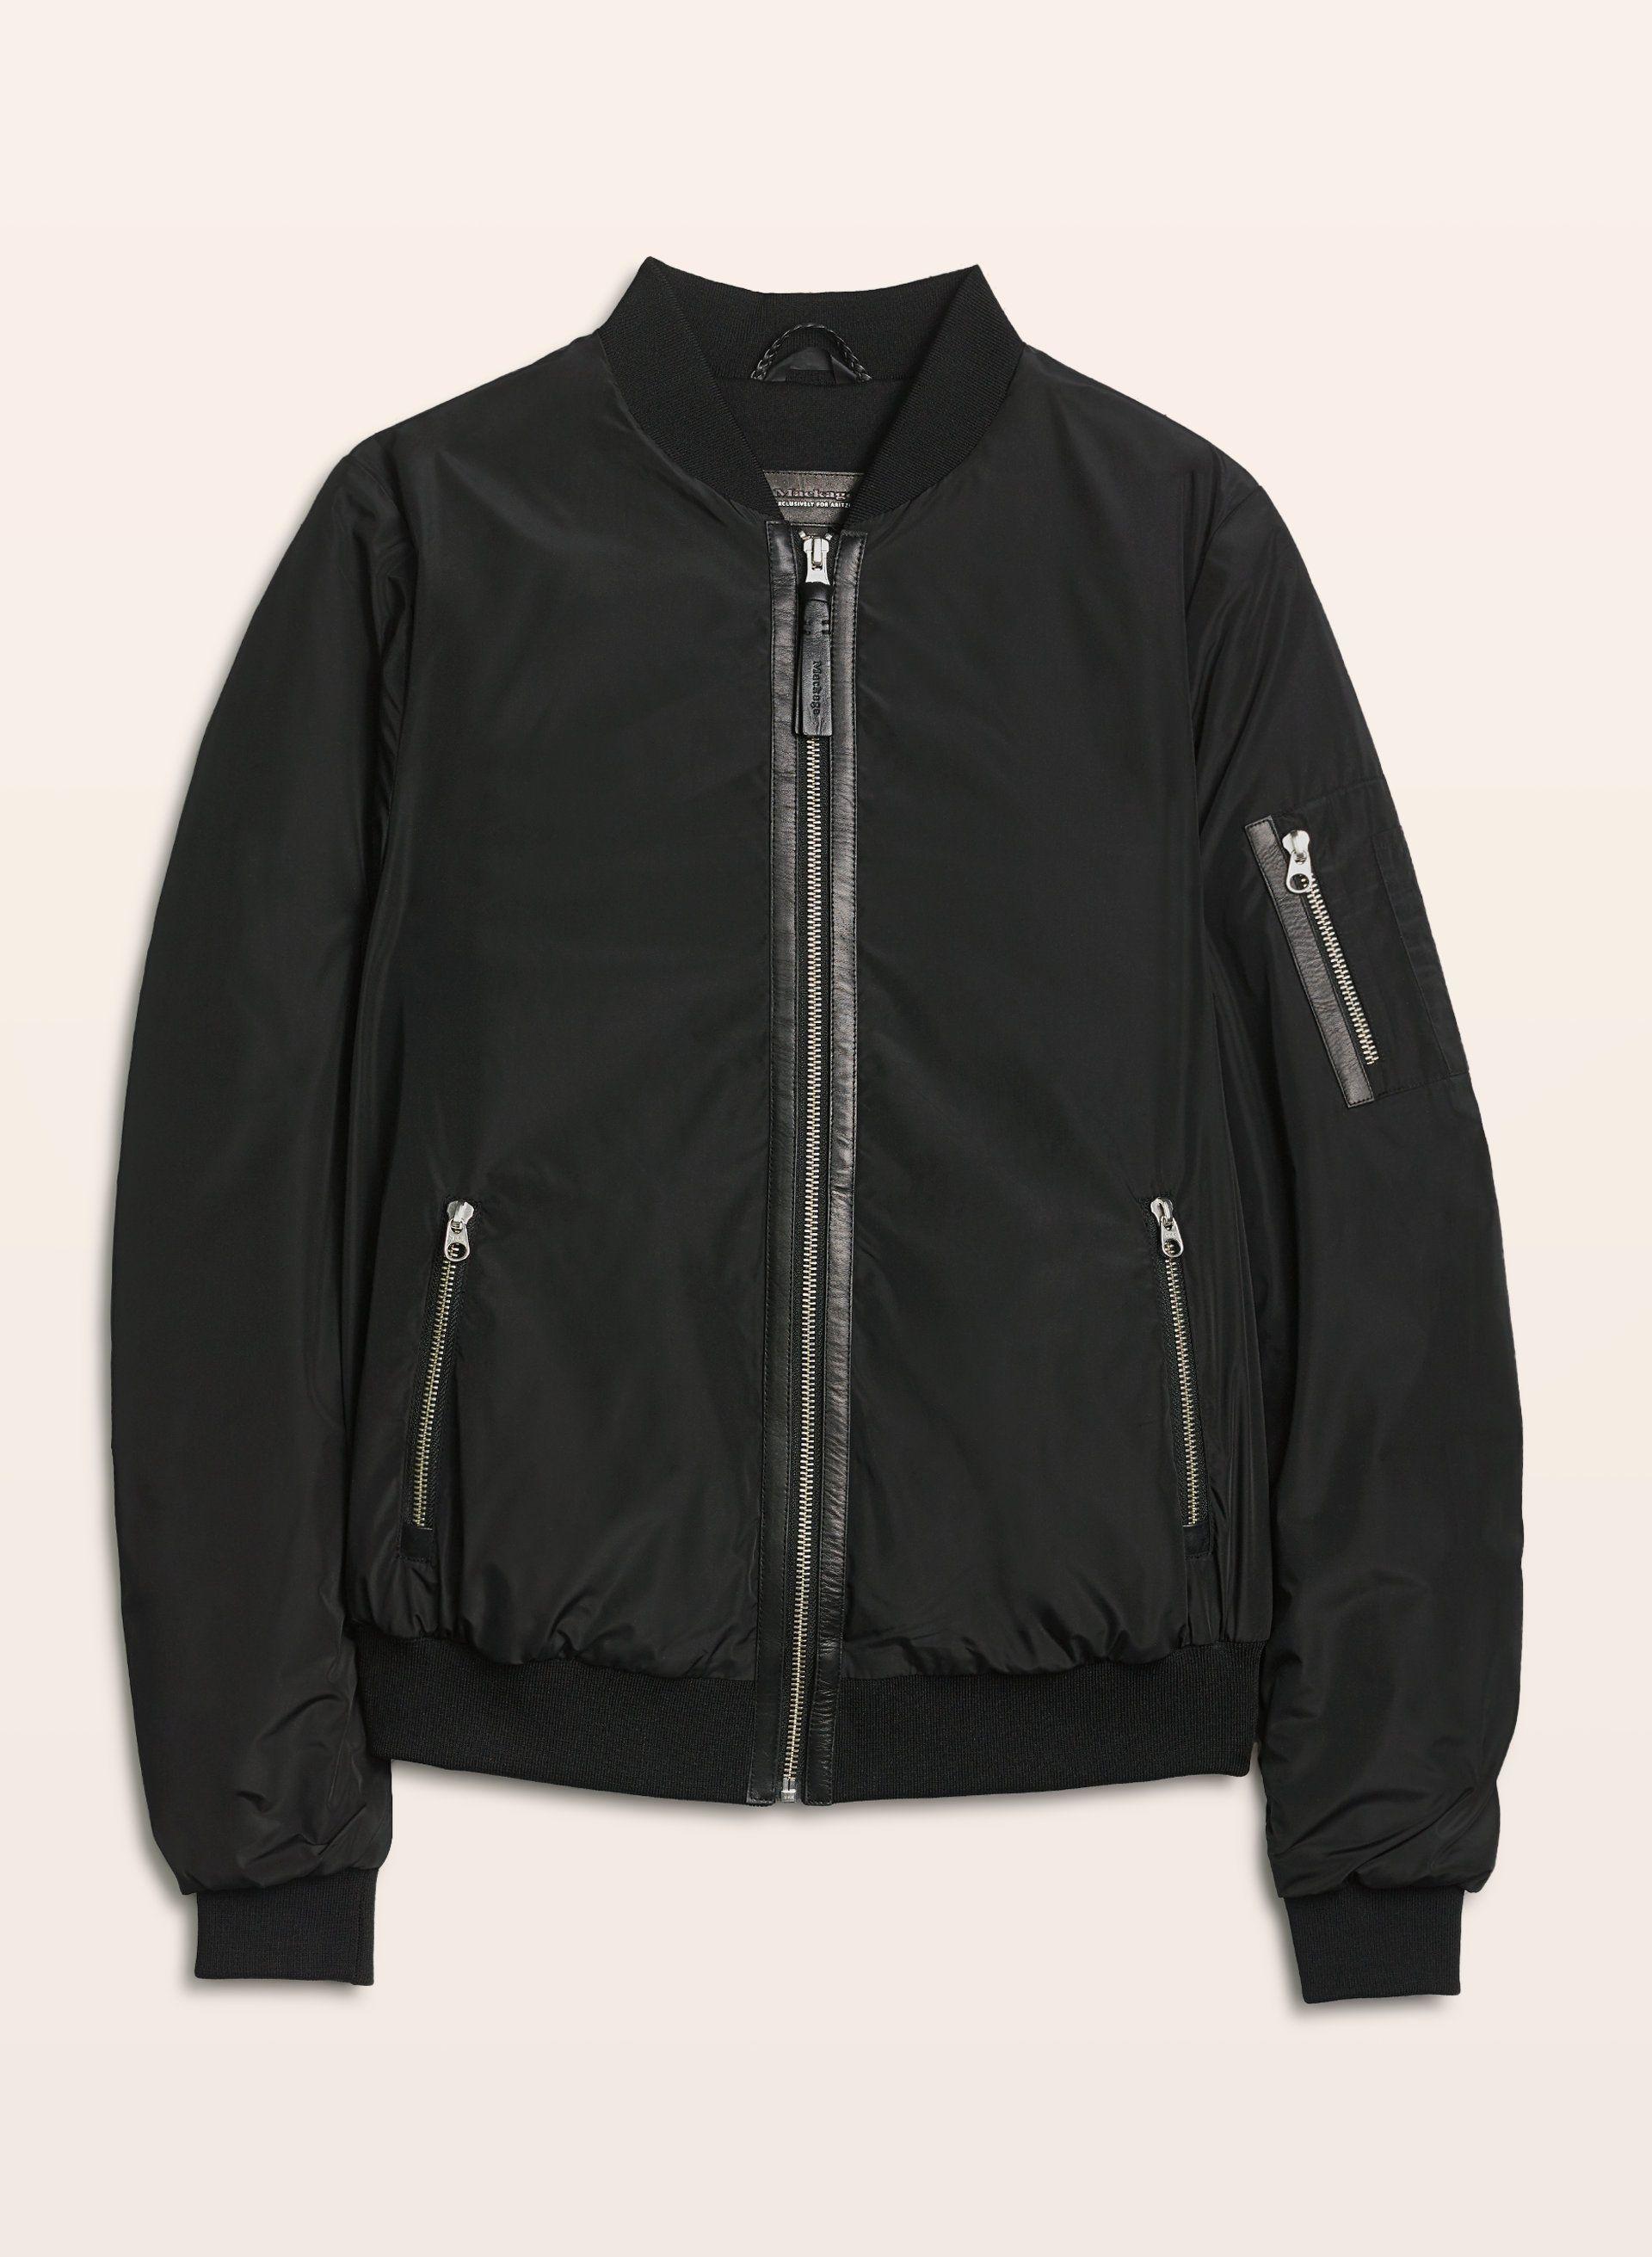 3b64f21d6ee5cb ... cara jacket 78ecc 5bdda coupon code for mackage cara jacket 78ecc  5bdda; hot rainy day outfits ideas in roma boots mackage leather jacket  express fedora ...